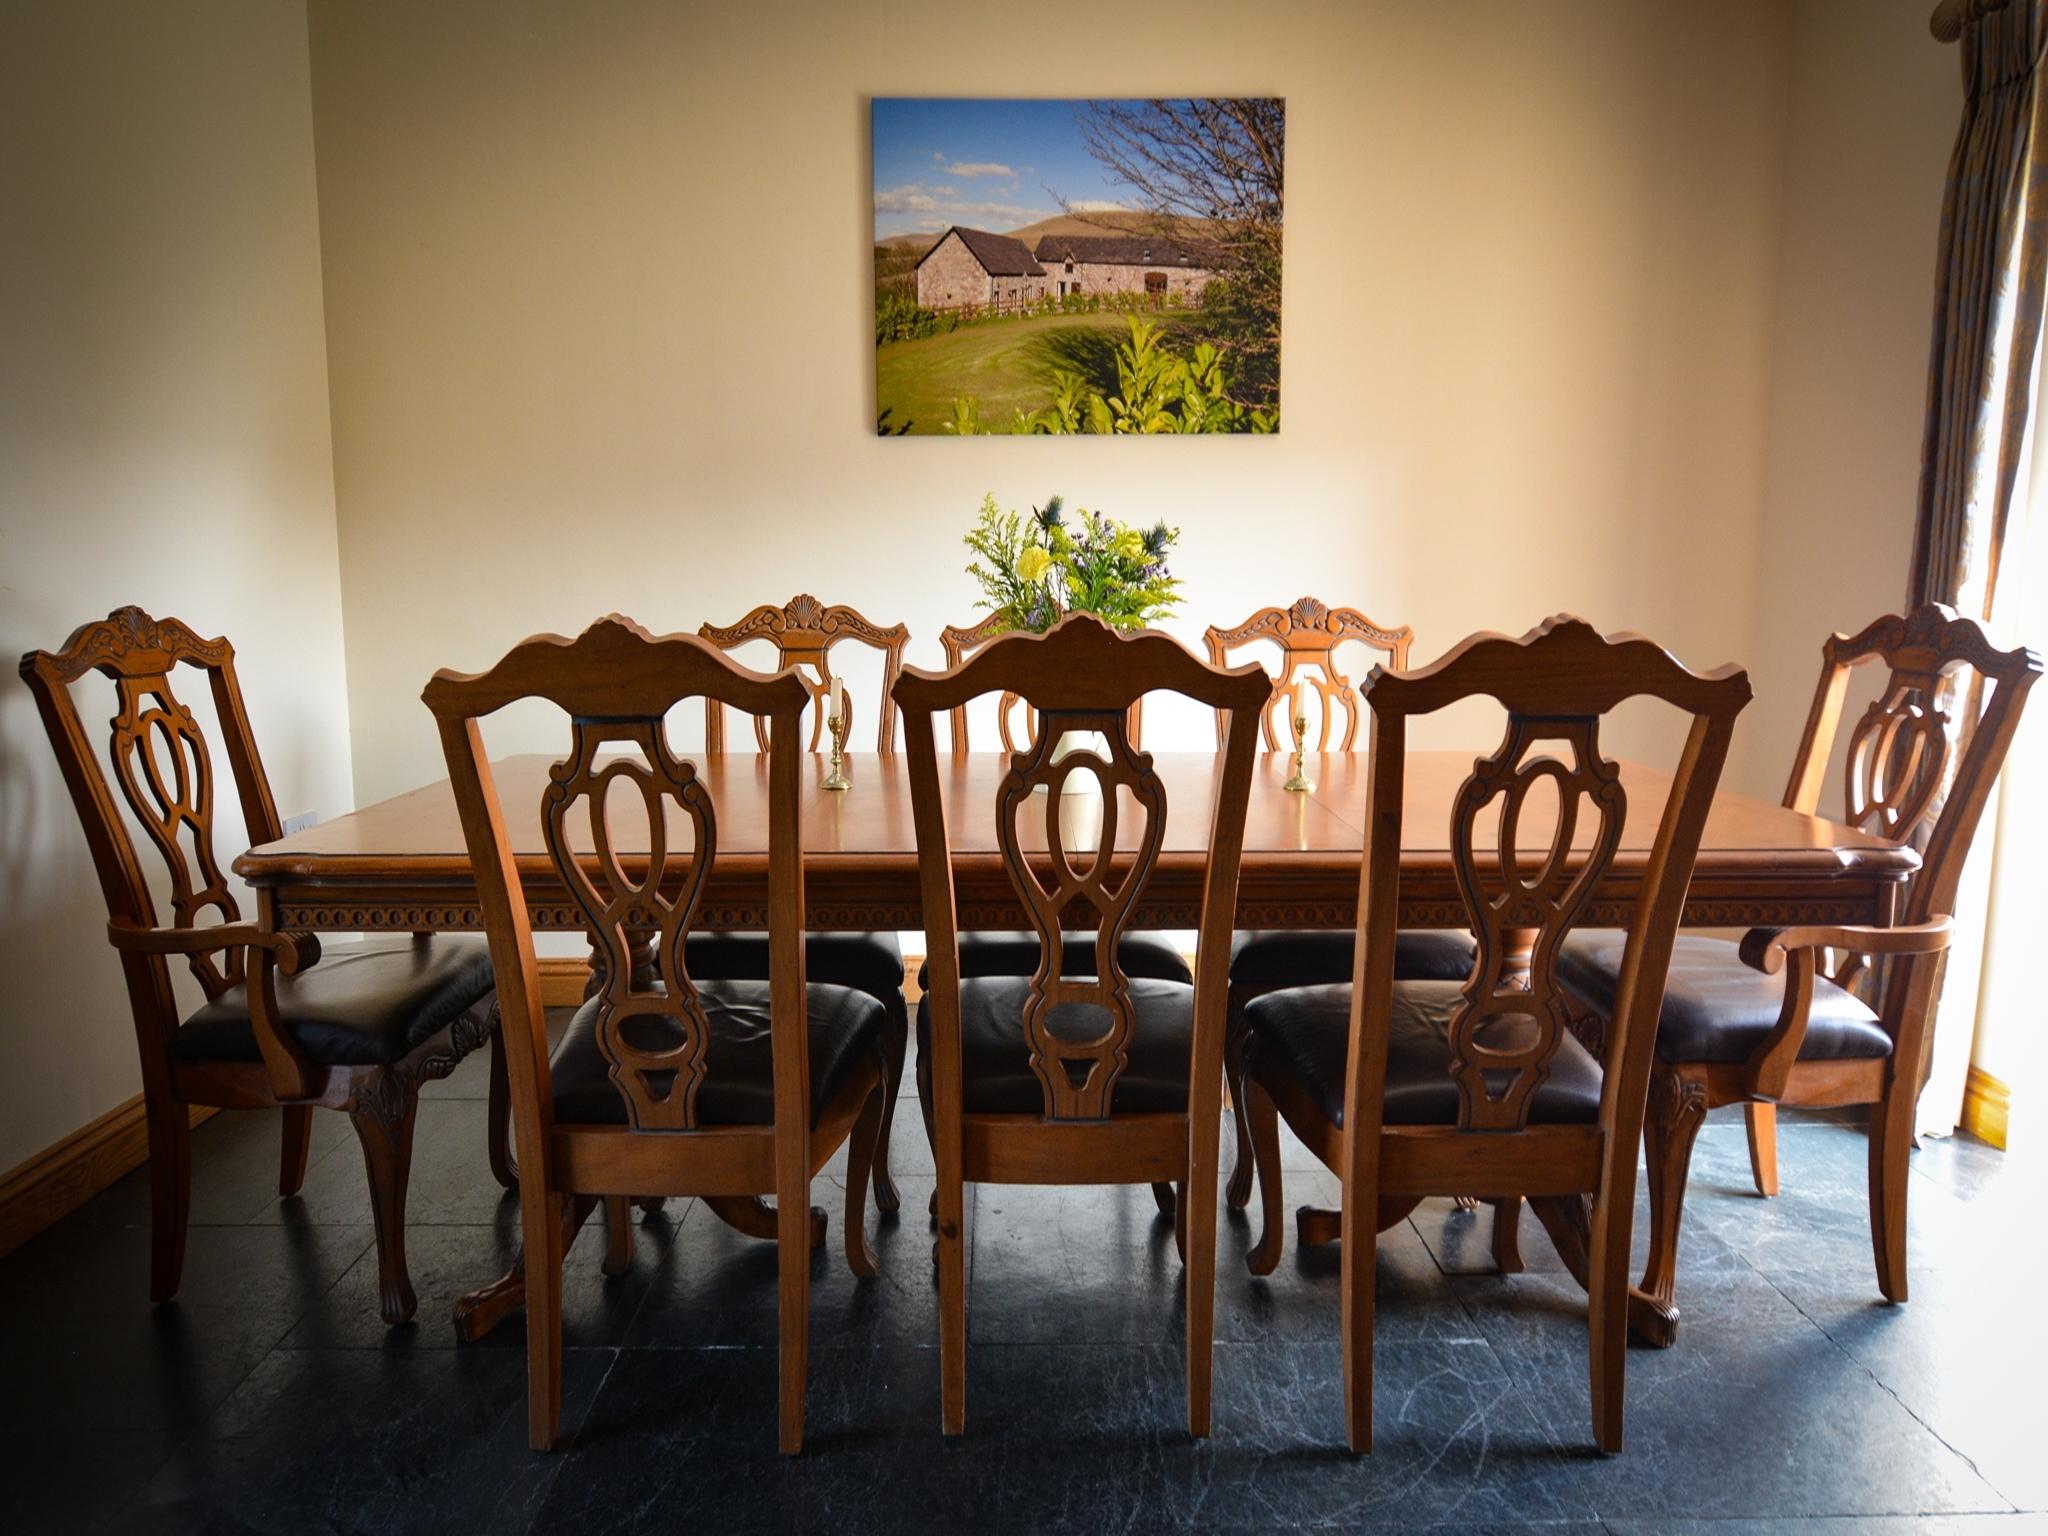 Barn-Family-Private Bathroom-Mountain View-Beacons Barn - 3 Night Stay Beacons